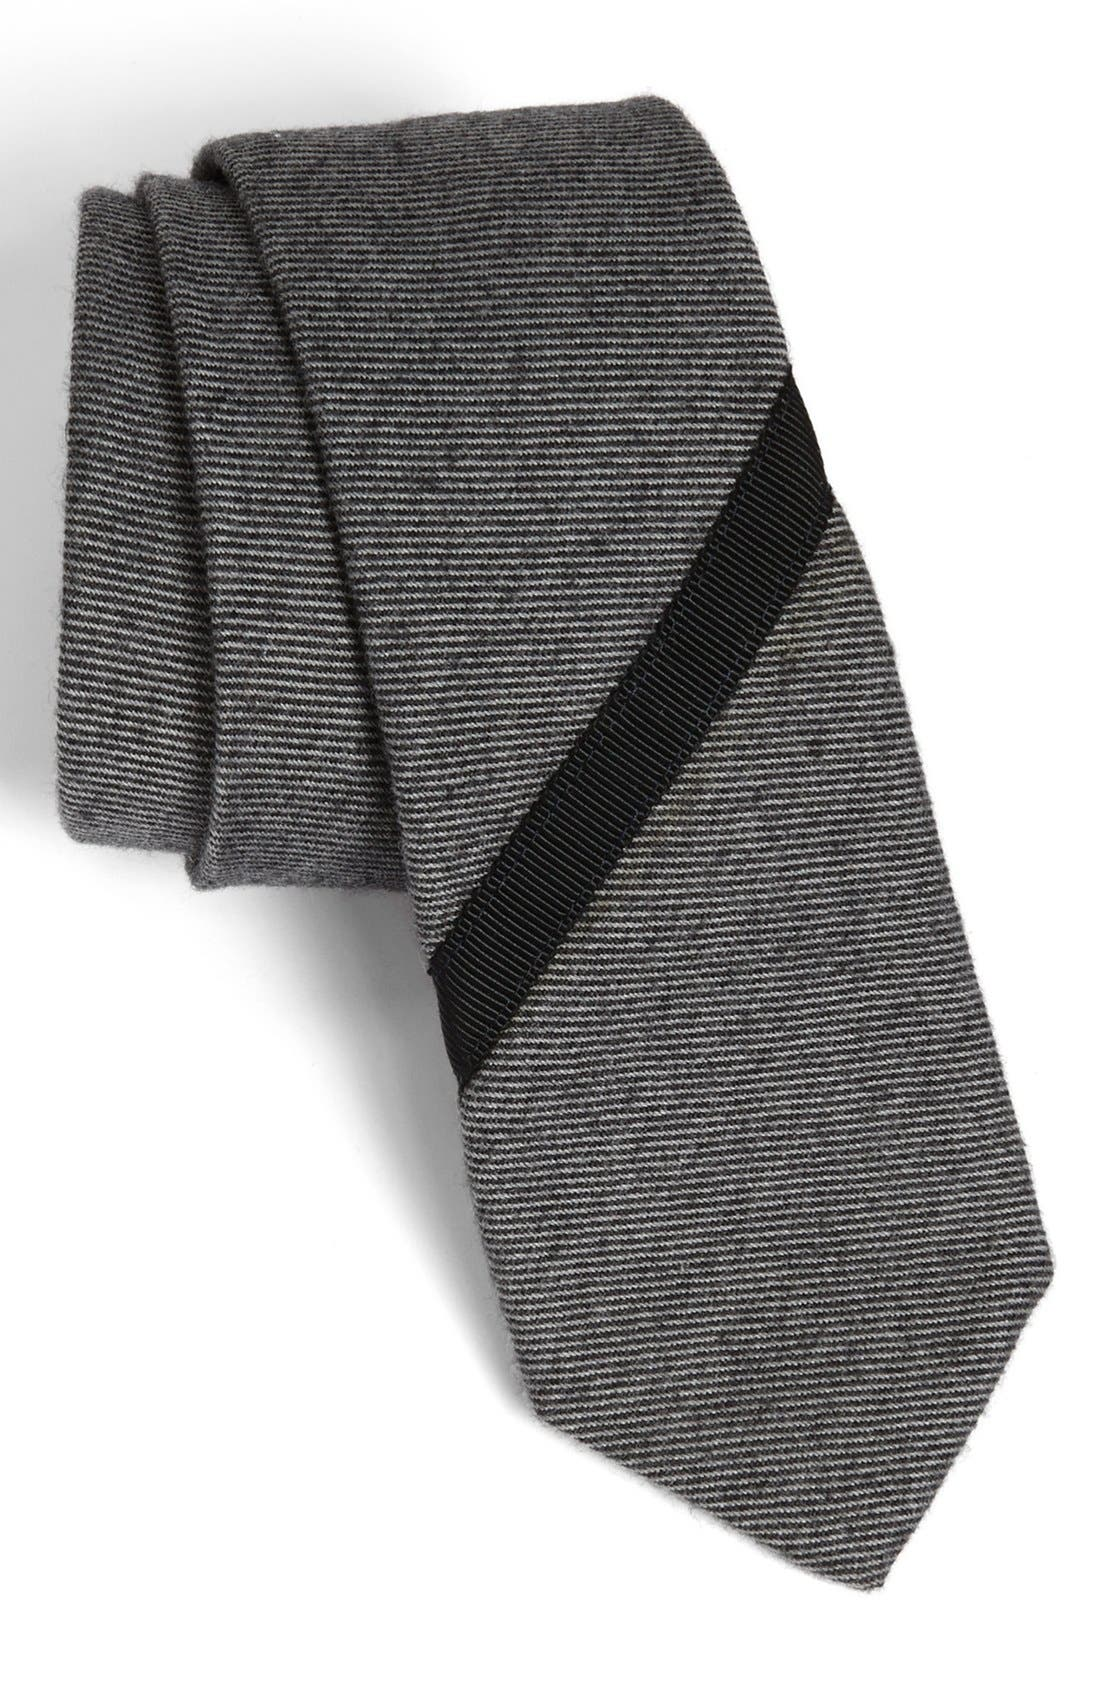 Alternate Image 1 Selected - rag & bone Woven Tie